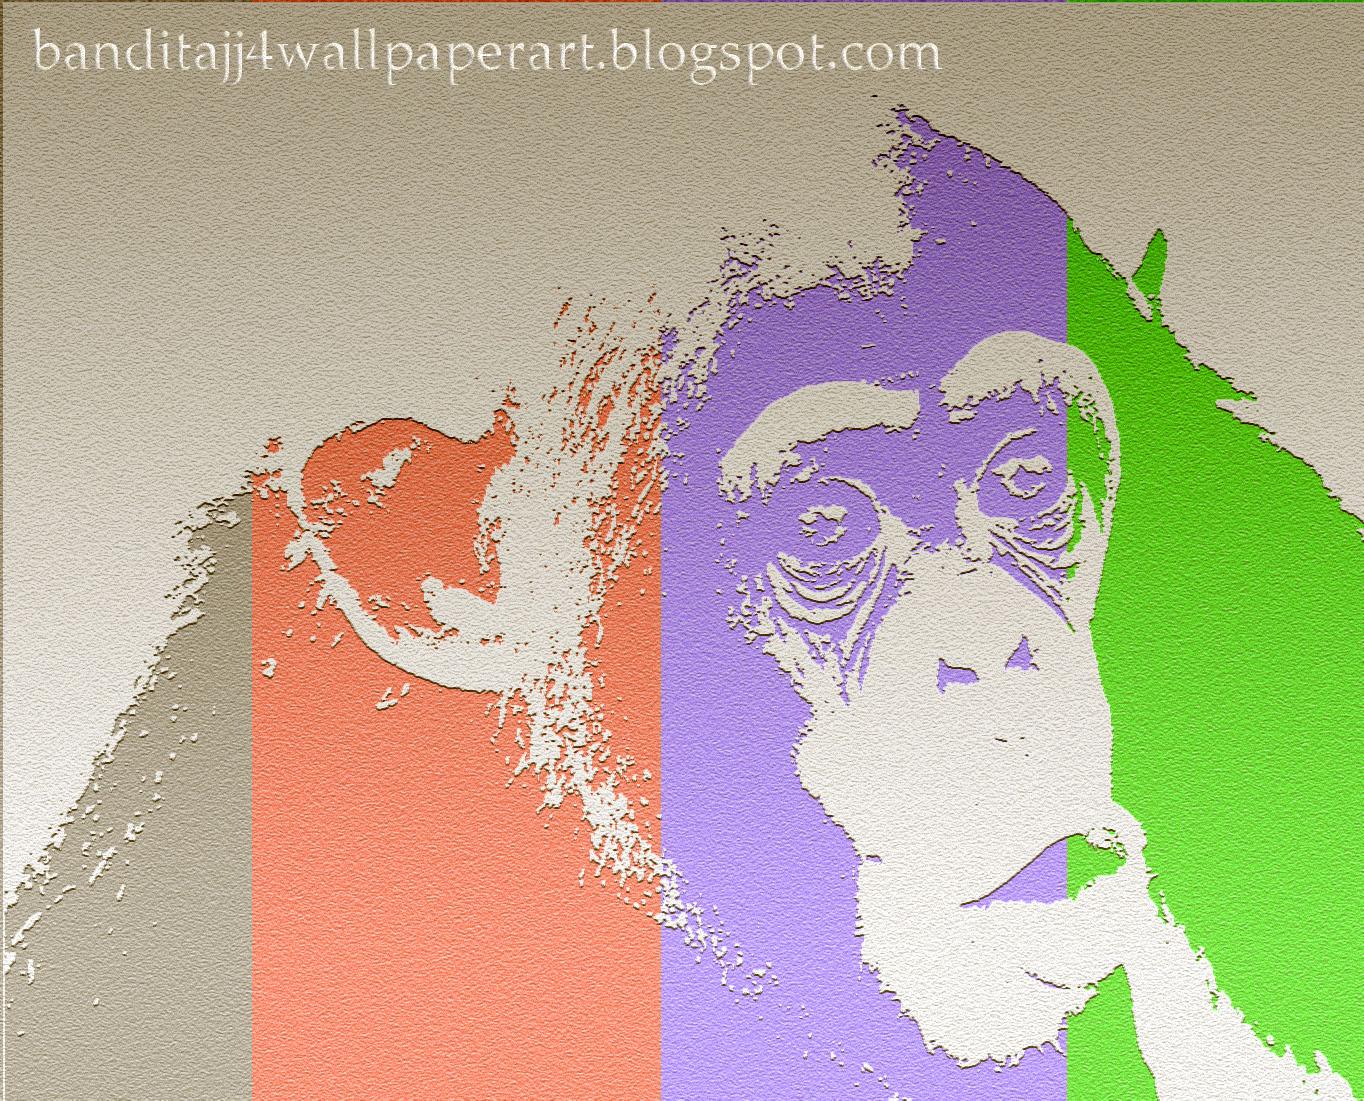 http://4.bp.blogspot.com/-NwmzhyHRrVM/TpsRml2d_hI/AAAAAAAAAKo/Z3luPNRjM-w/s1600/animal-monkey-bussiness.banditajj4wallpaperart.blogspot.com.jpg